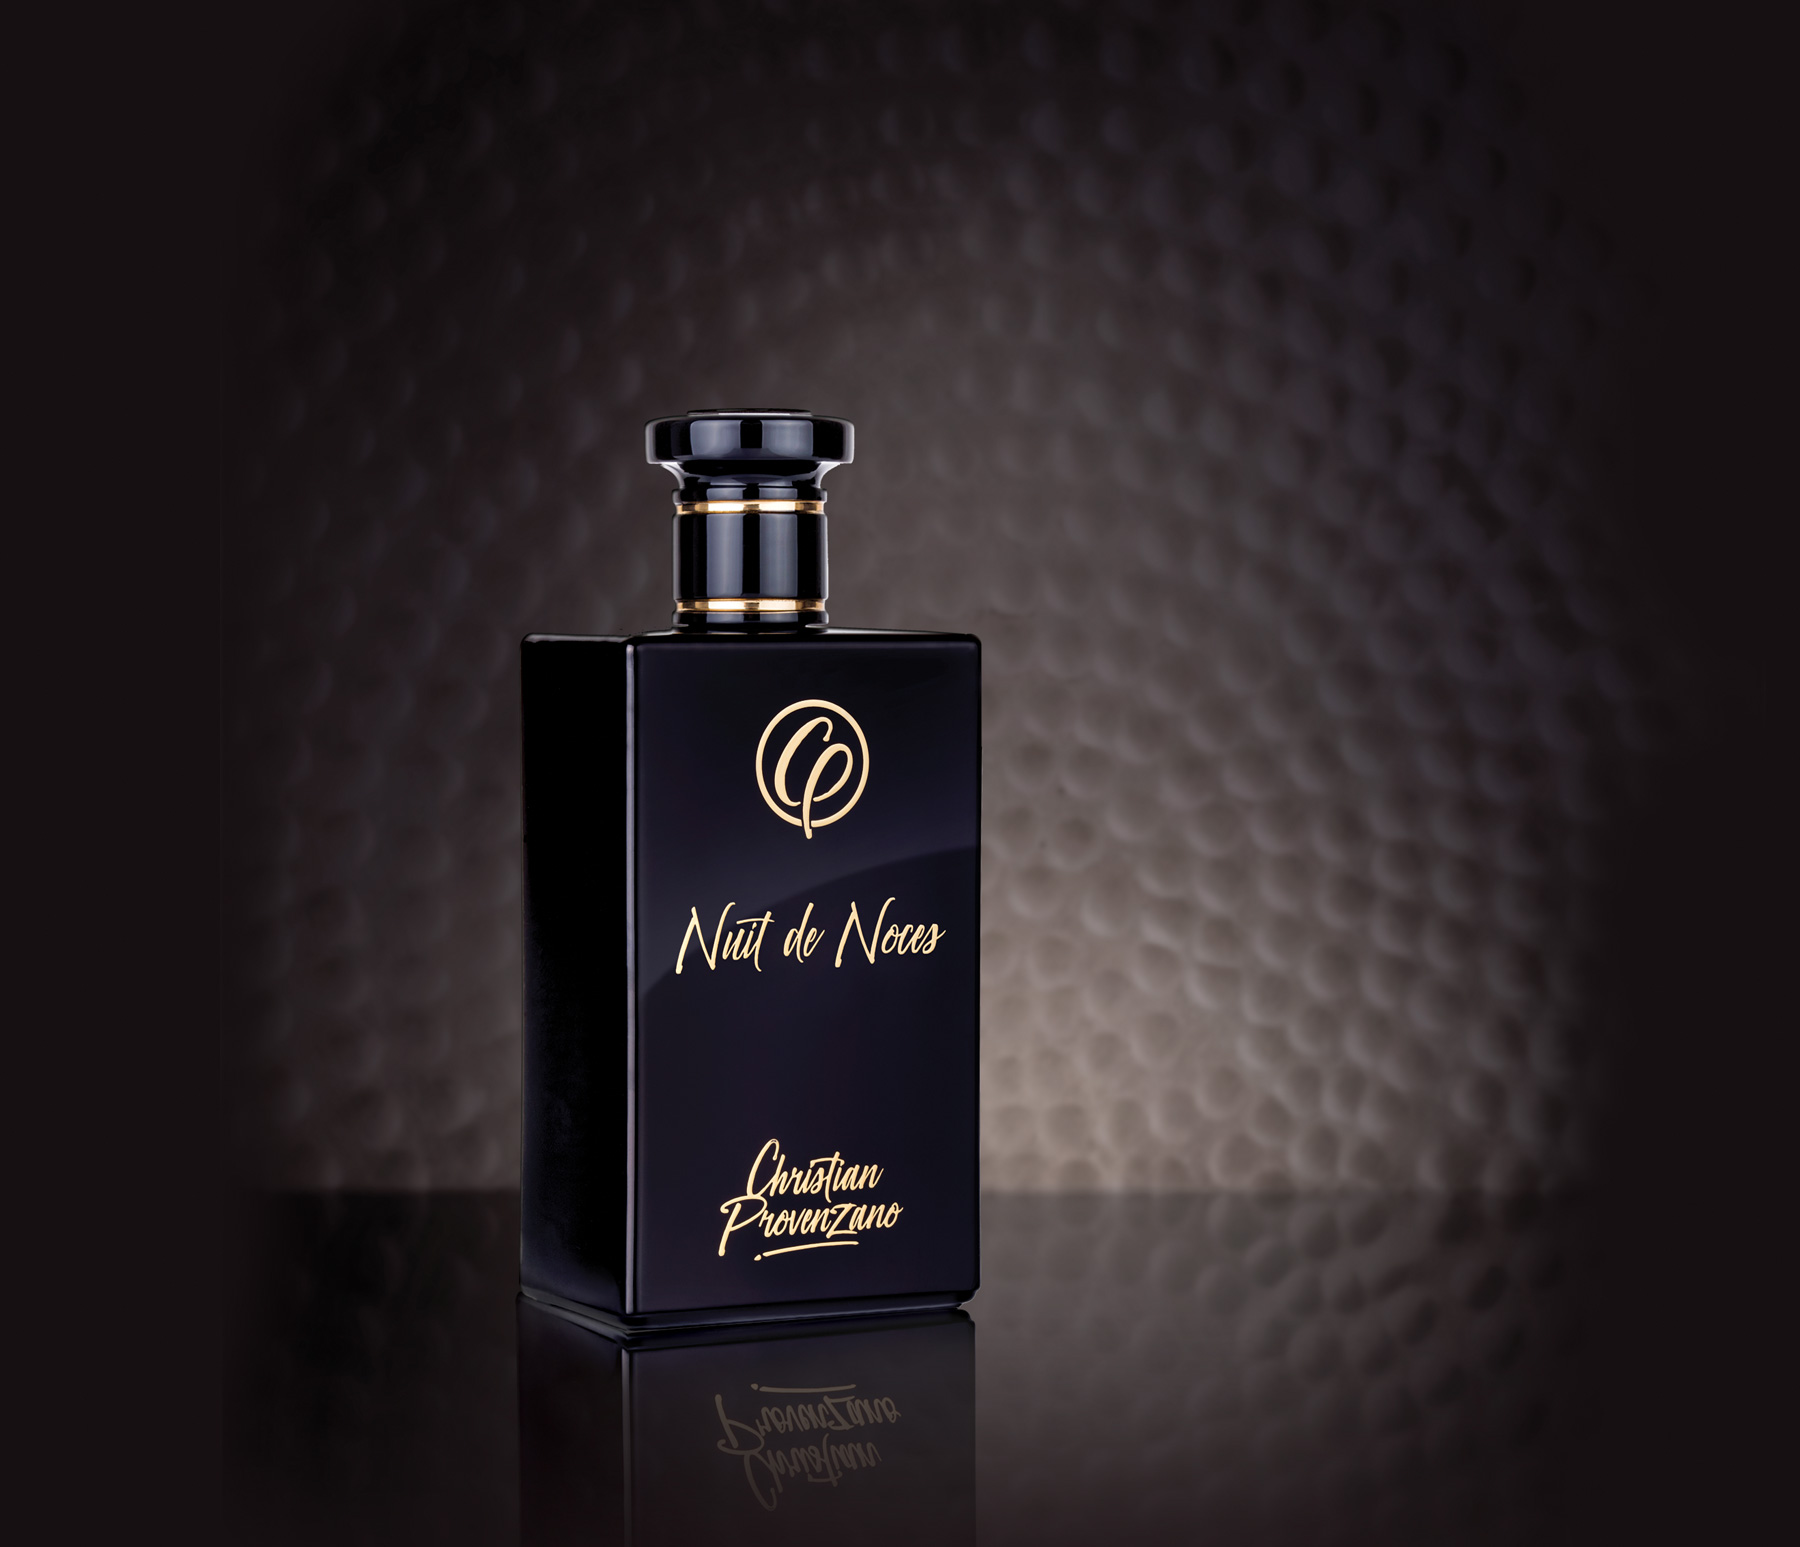 nuit de noces christian provenzano parfums perfumy to nowe perfumy dla kobiet i m czyzn 2018. Black Bedroom Furniture Sets. Home Design Ideas